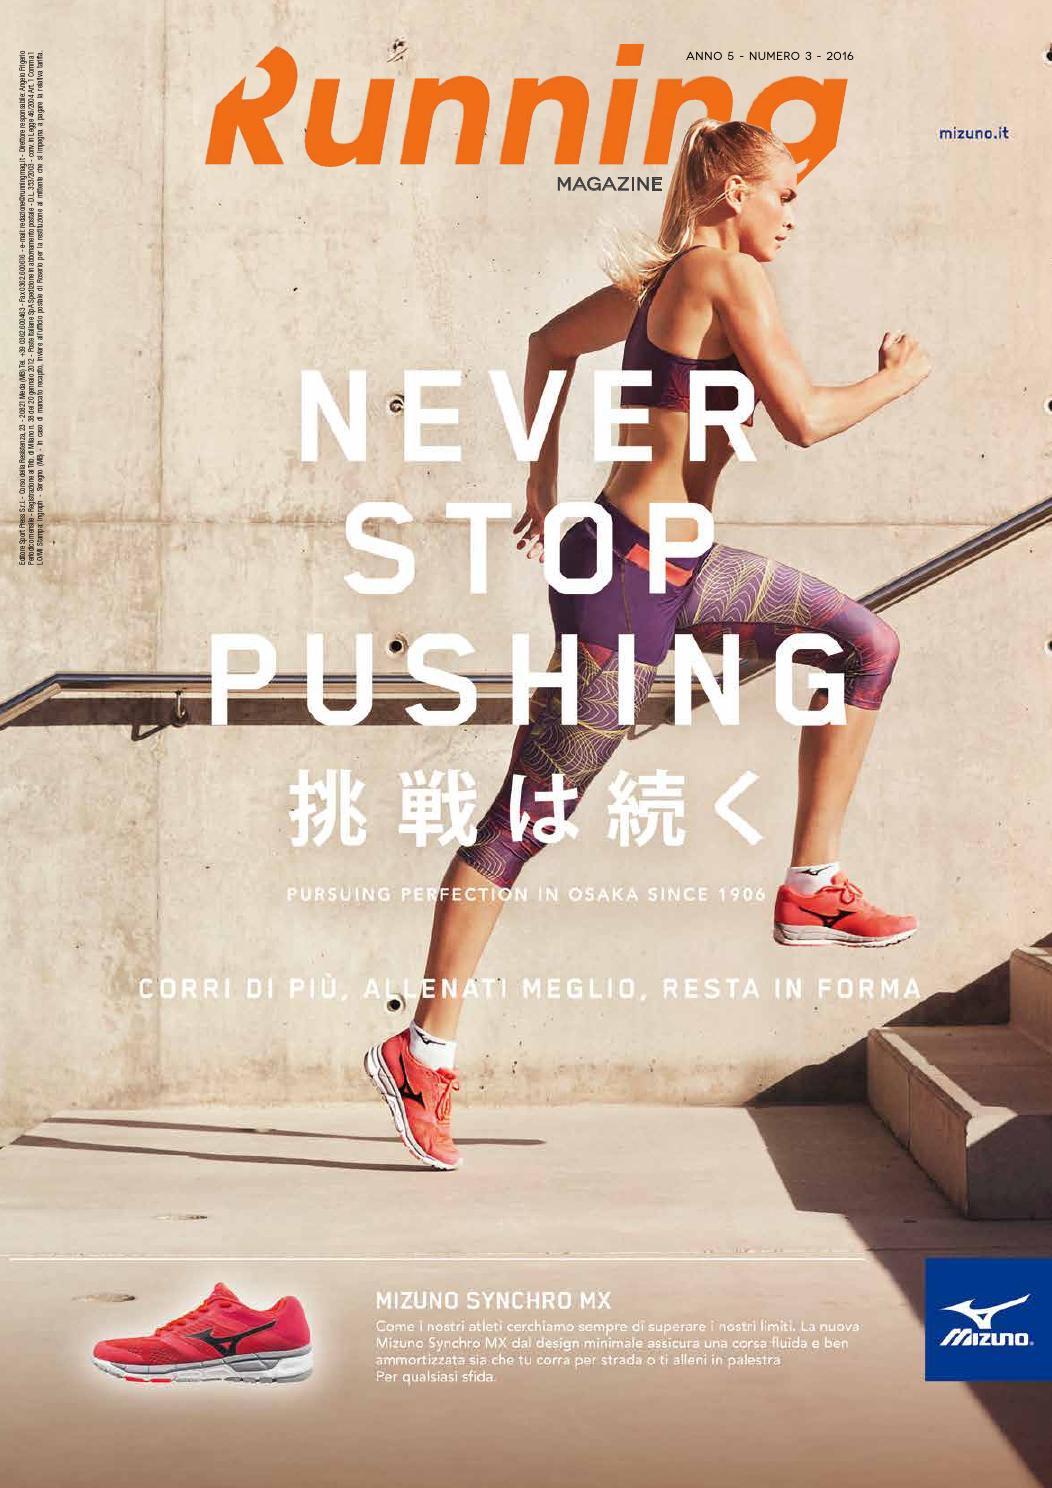 Running 3 2016 Sport Mag By Press Issuu K1JcTlF3